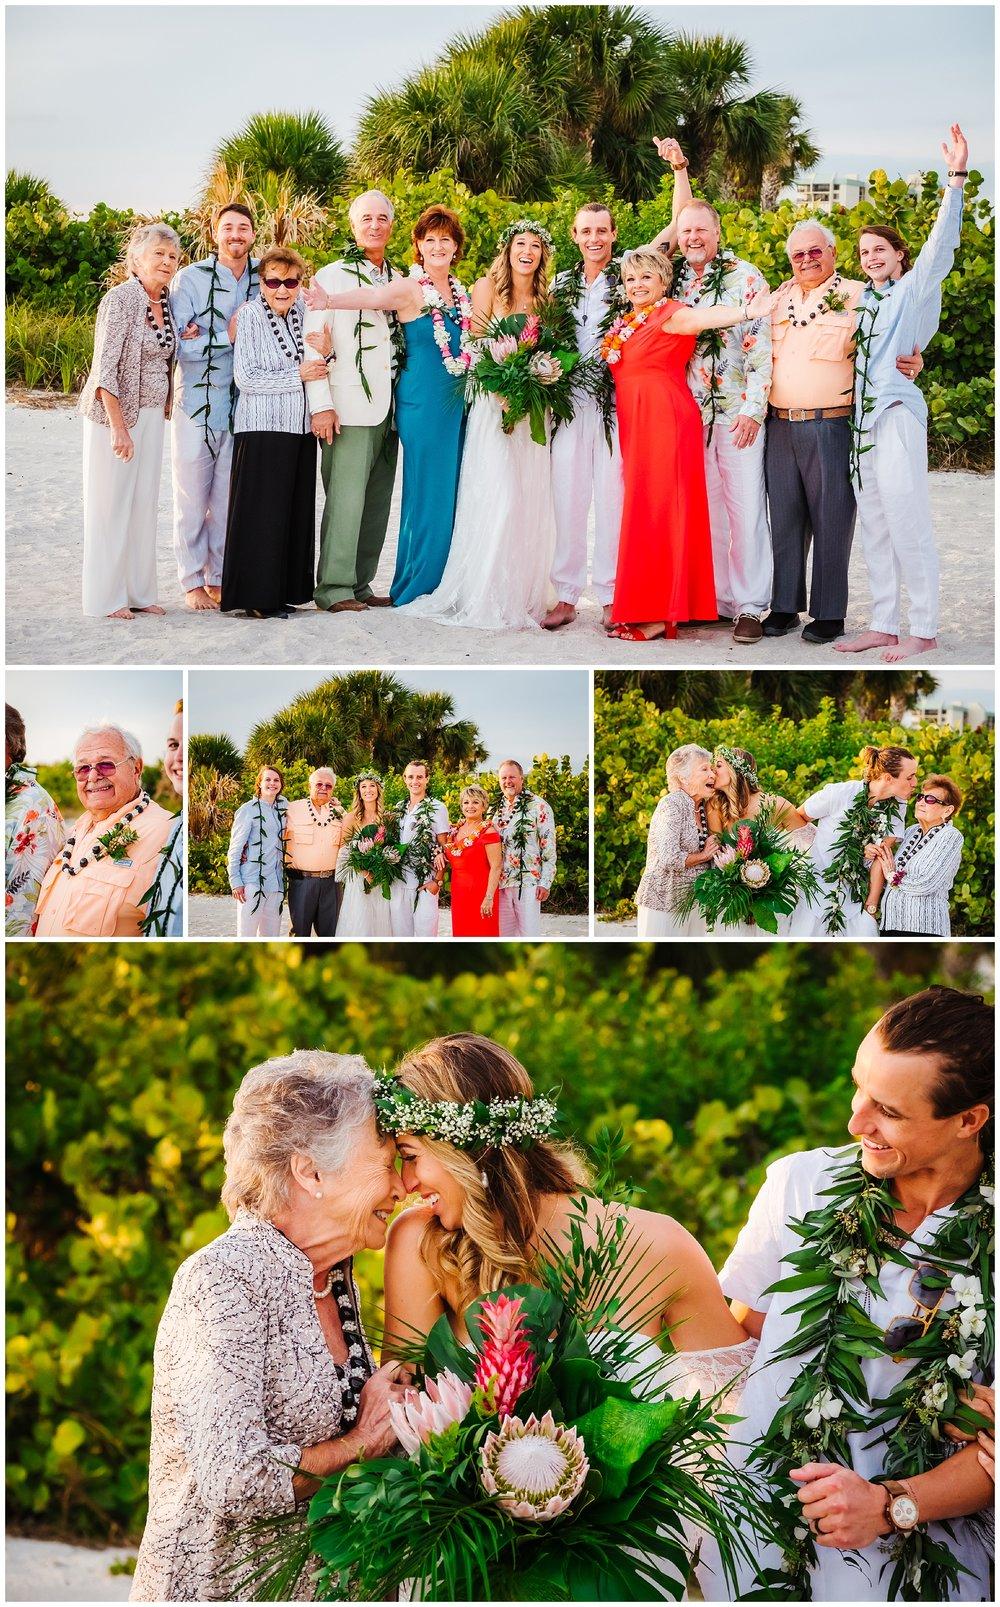 tampa-bay-wedding-photographer-barefoot-post-card-inn-tropical-hawaiin-lei-pink-pineapples-flower-crown_0178.jpg